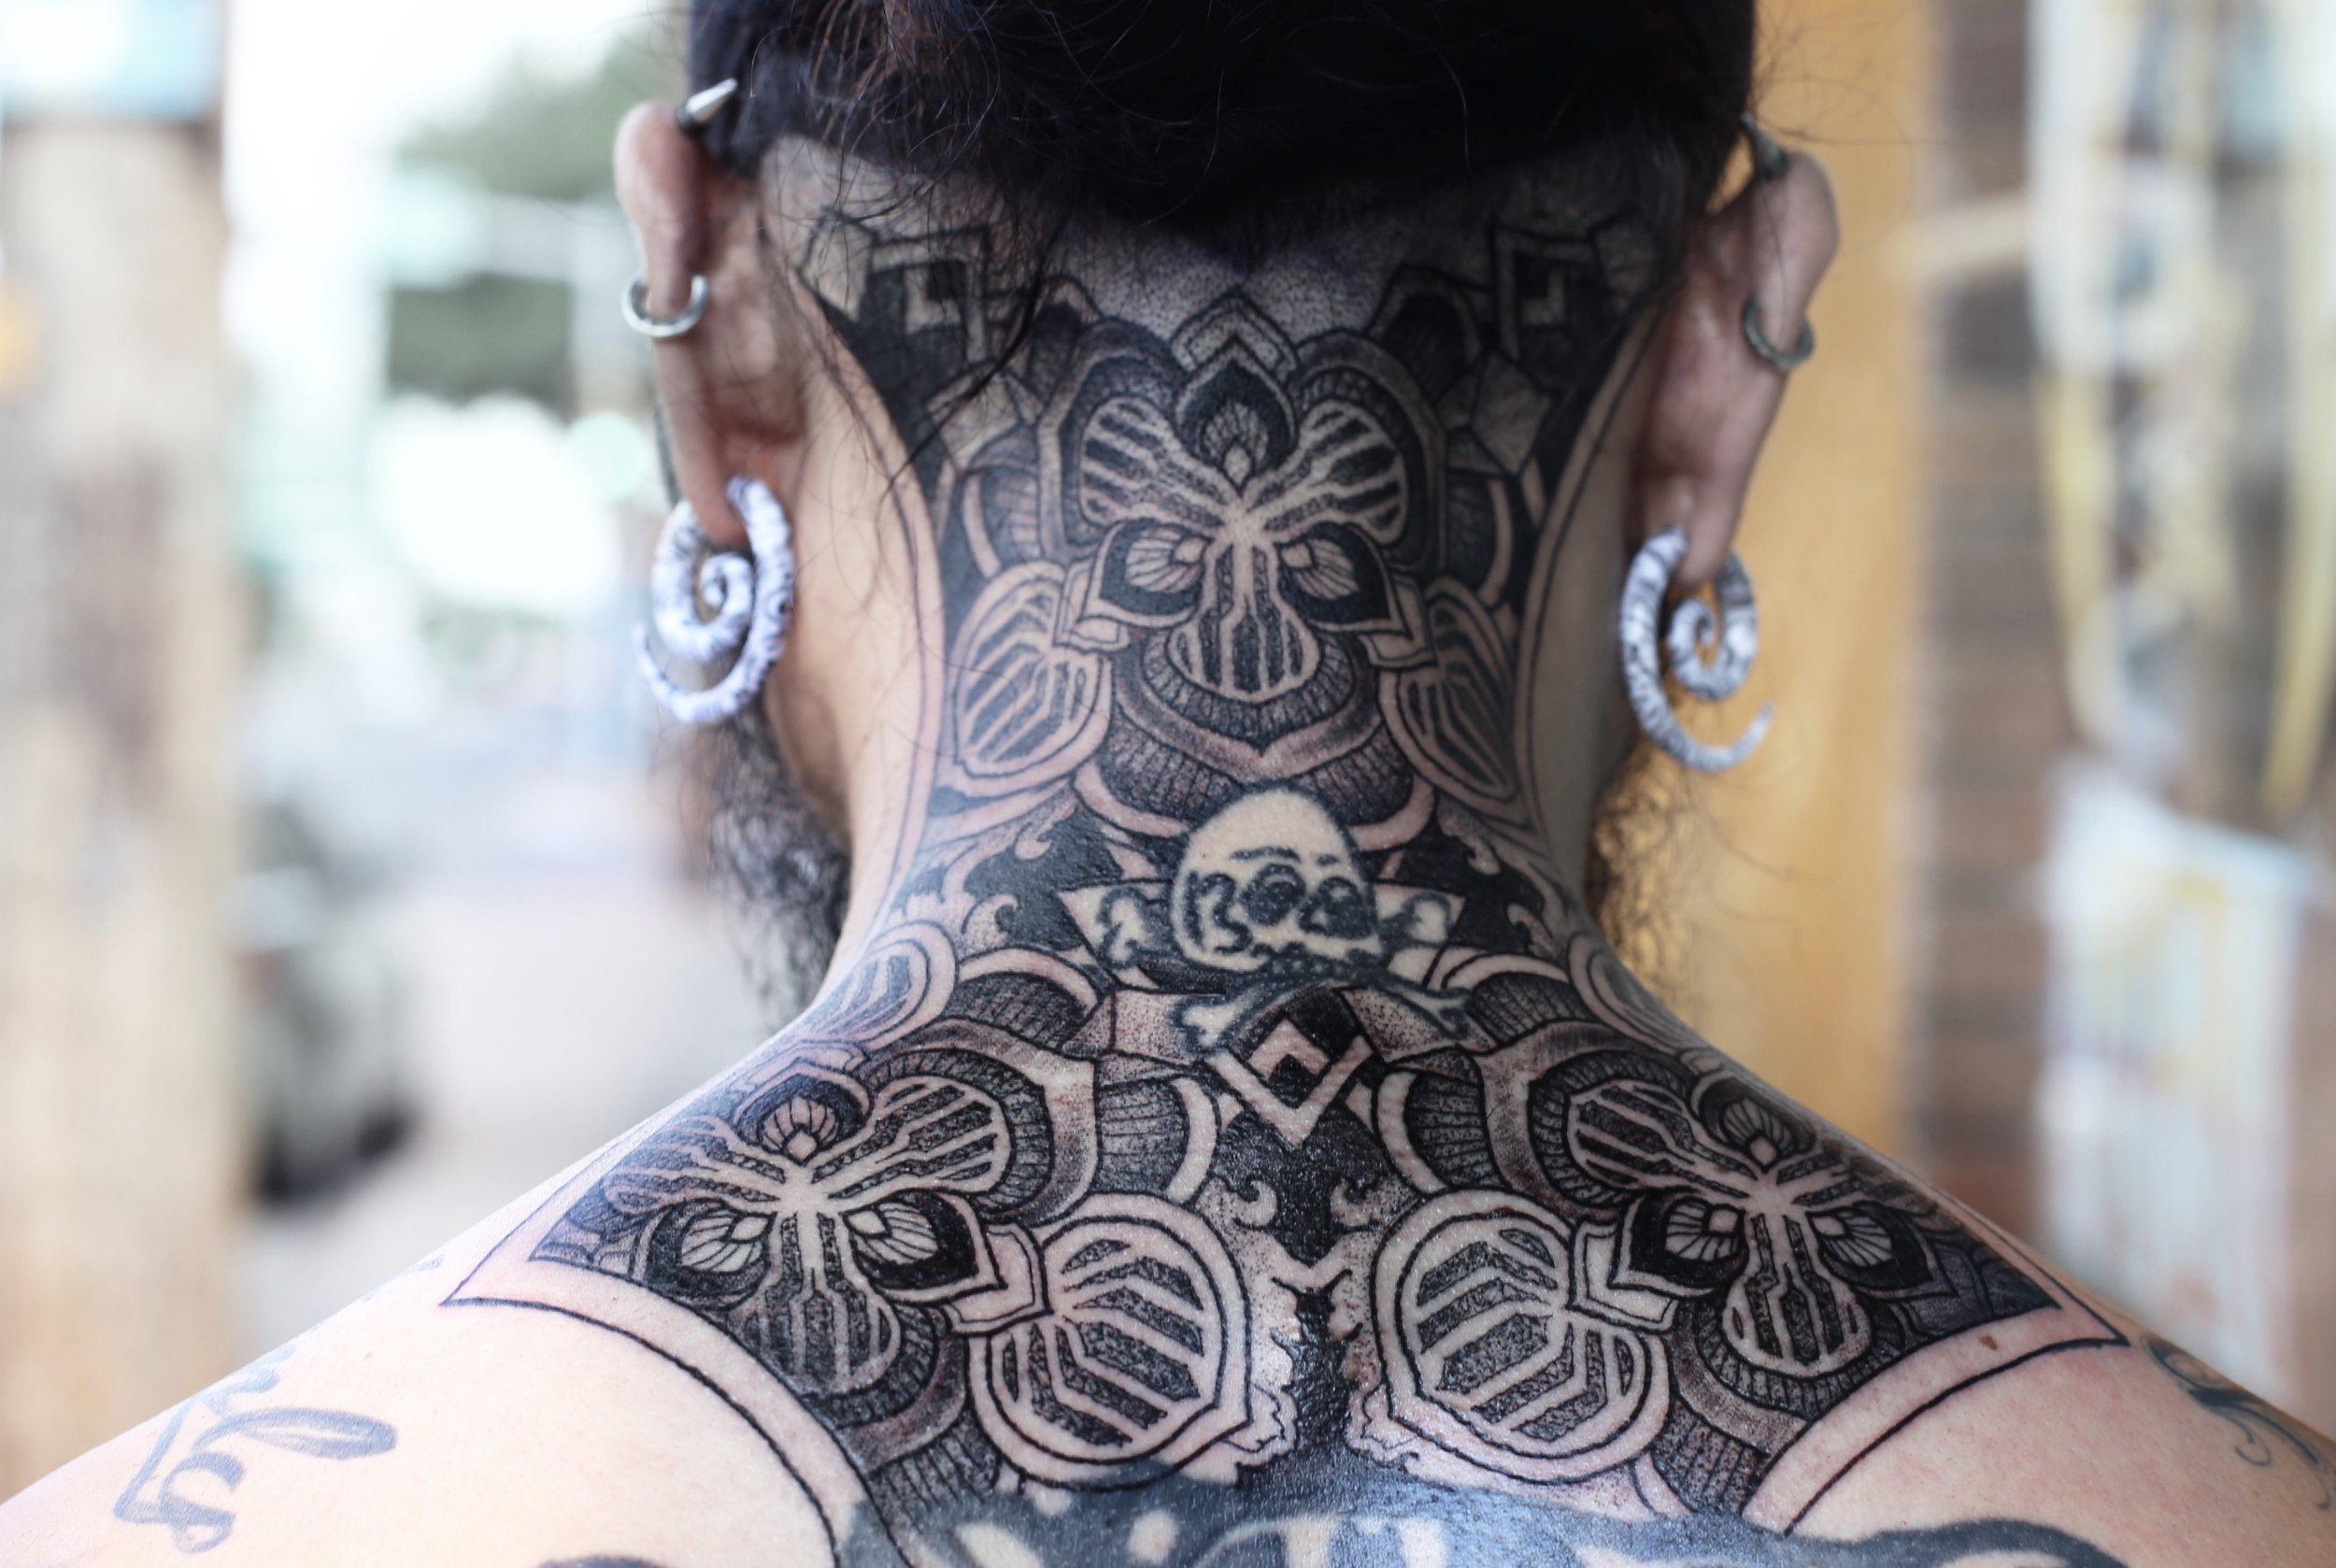 Enrique Ejay Bernal dallas tattoo best special k kenneth neck patterns.jpg